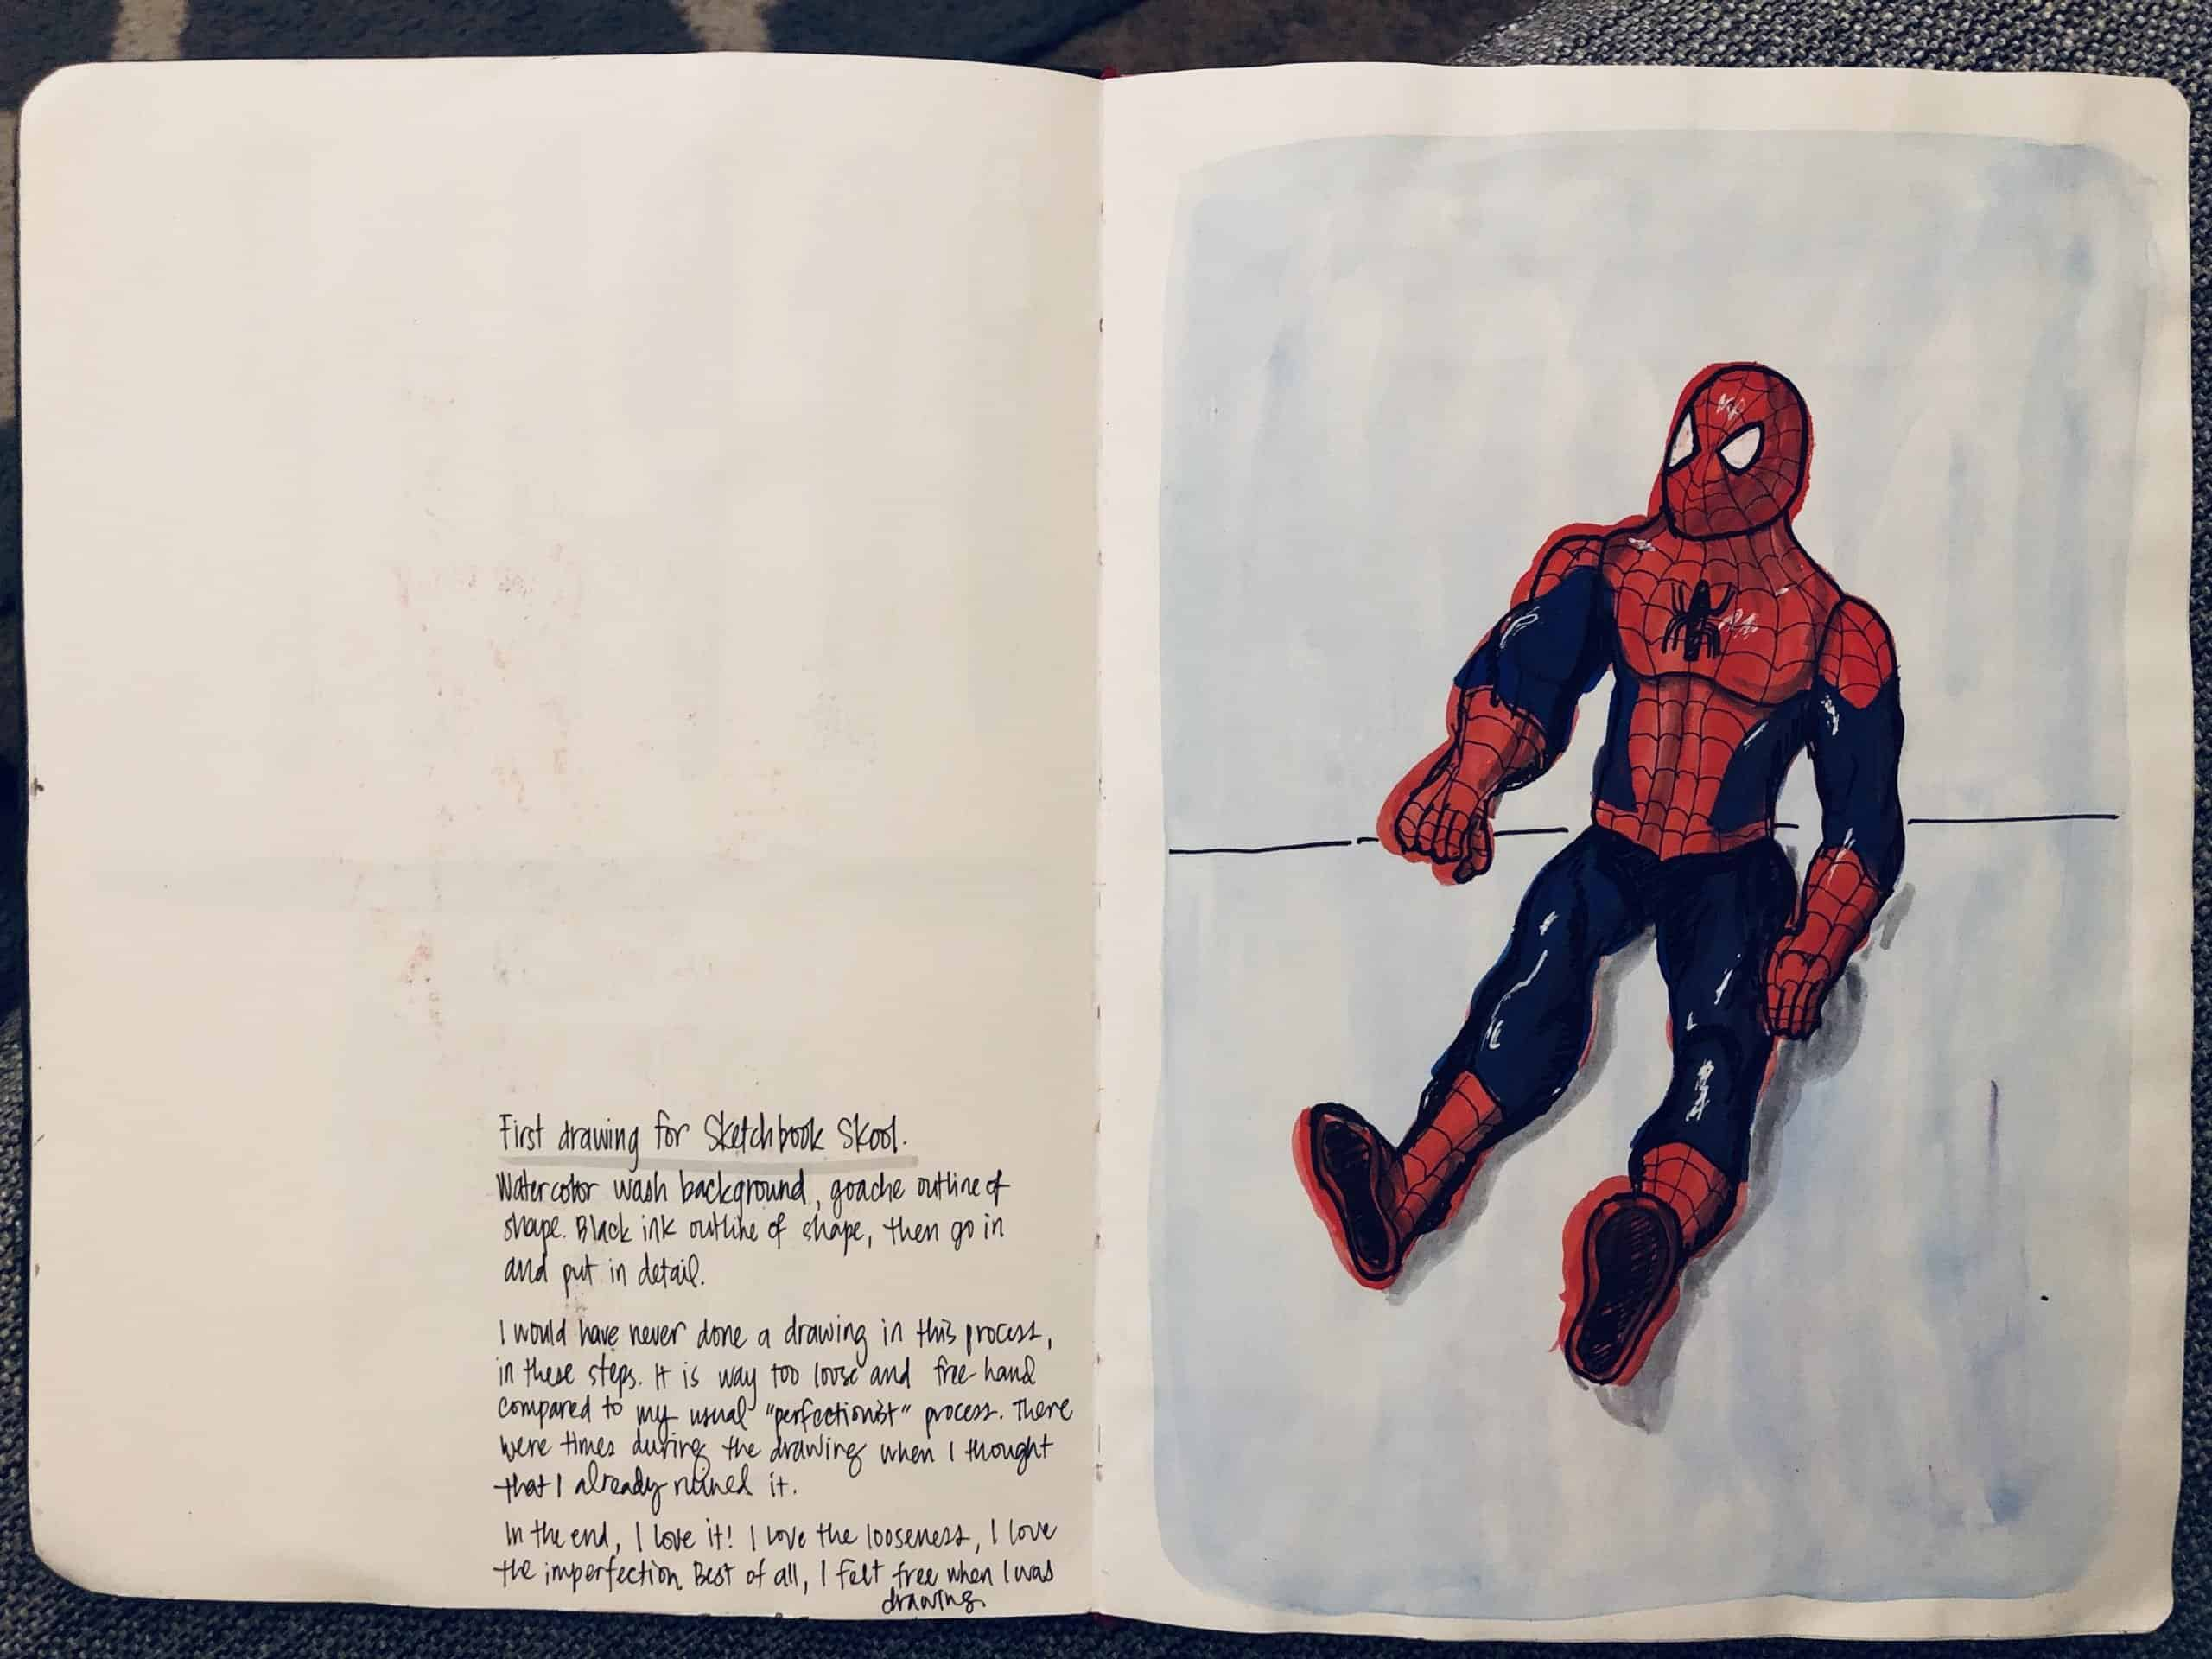 Elaine Villasper sketchbook